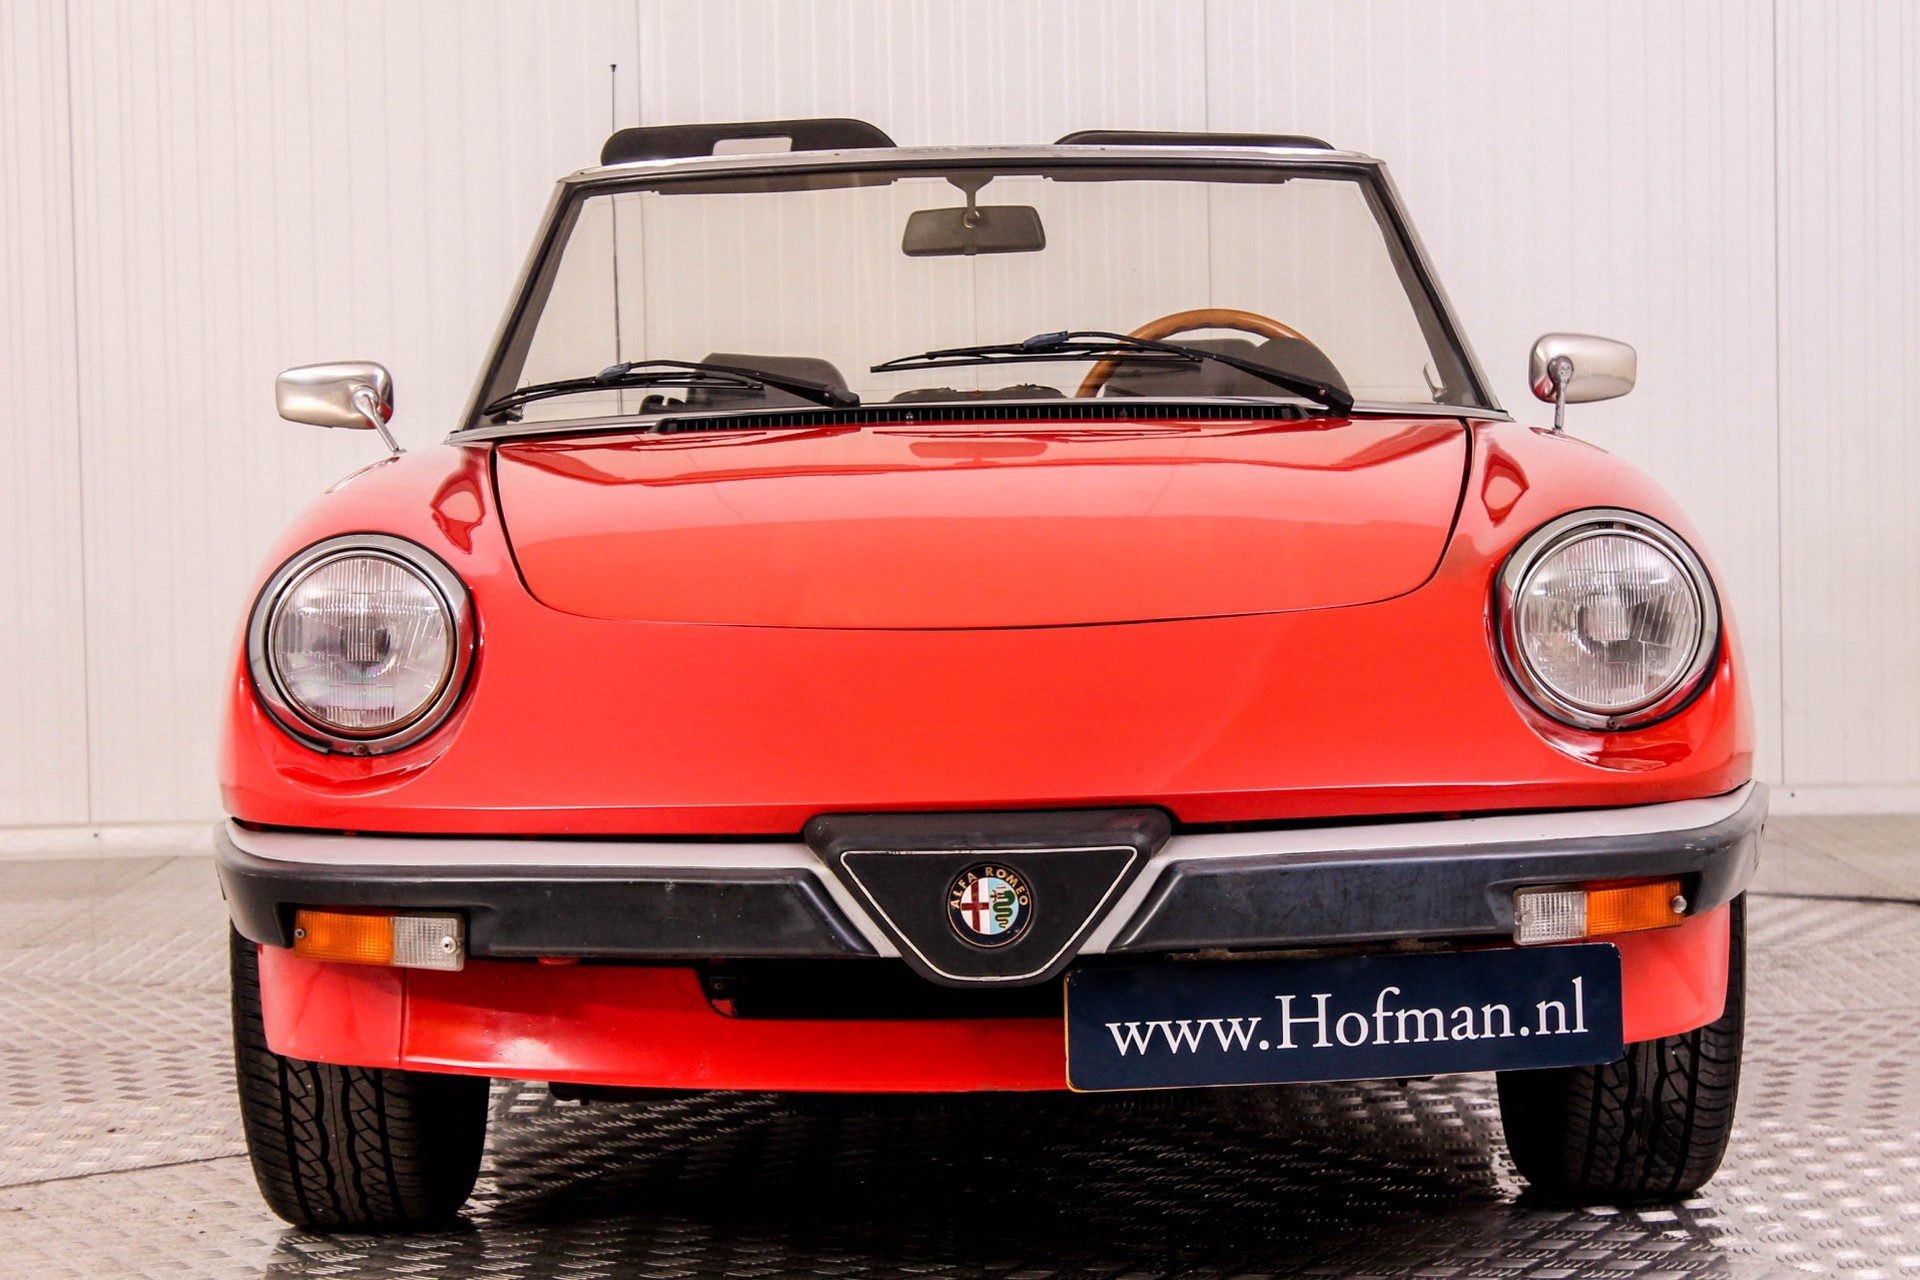 Alfa Romeo Spider 1600 Foto 6